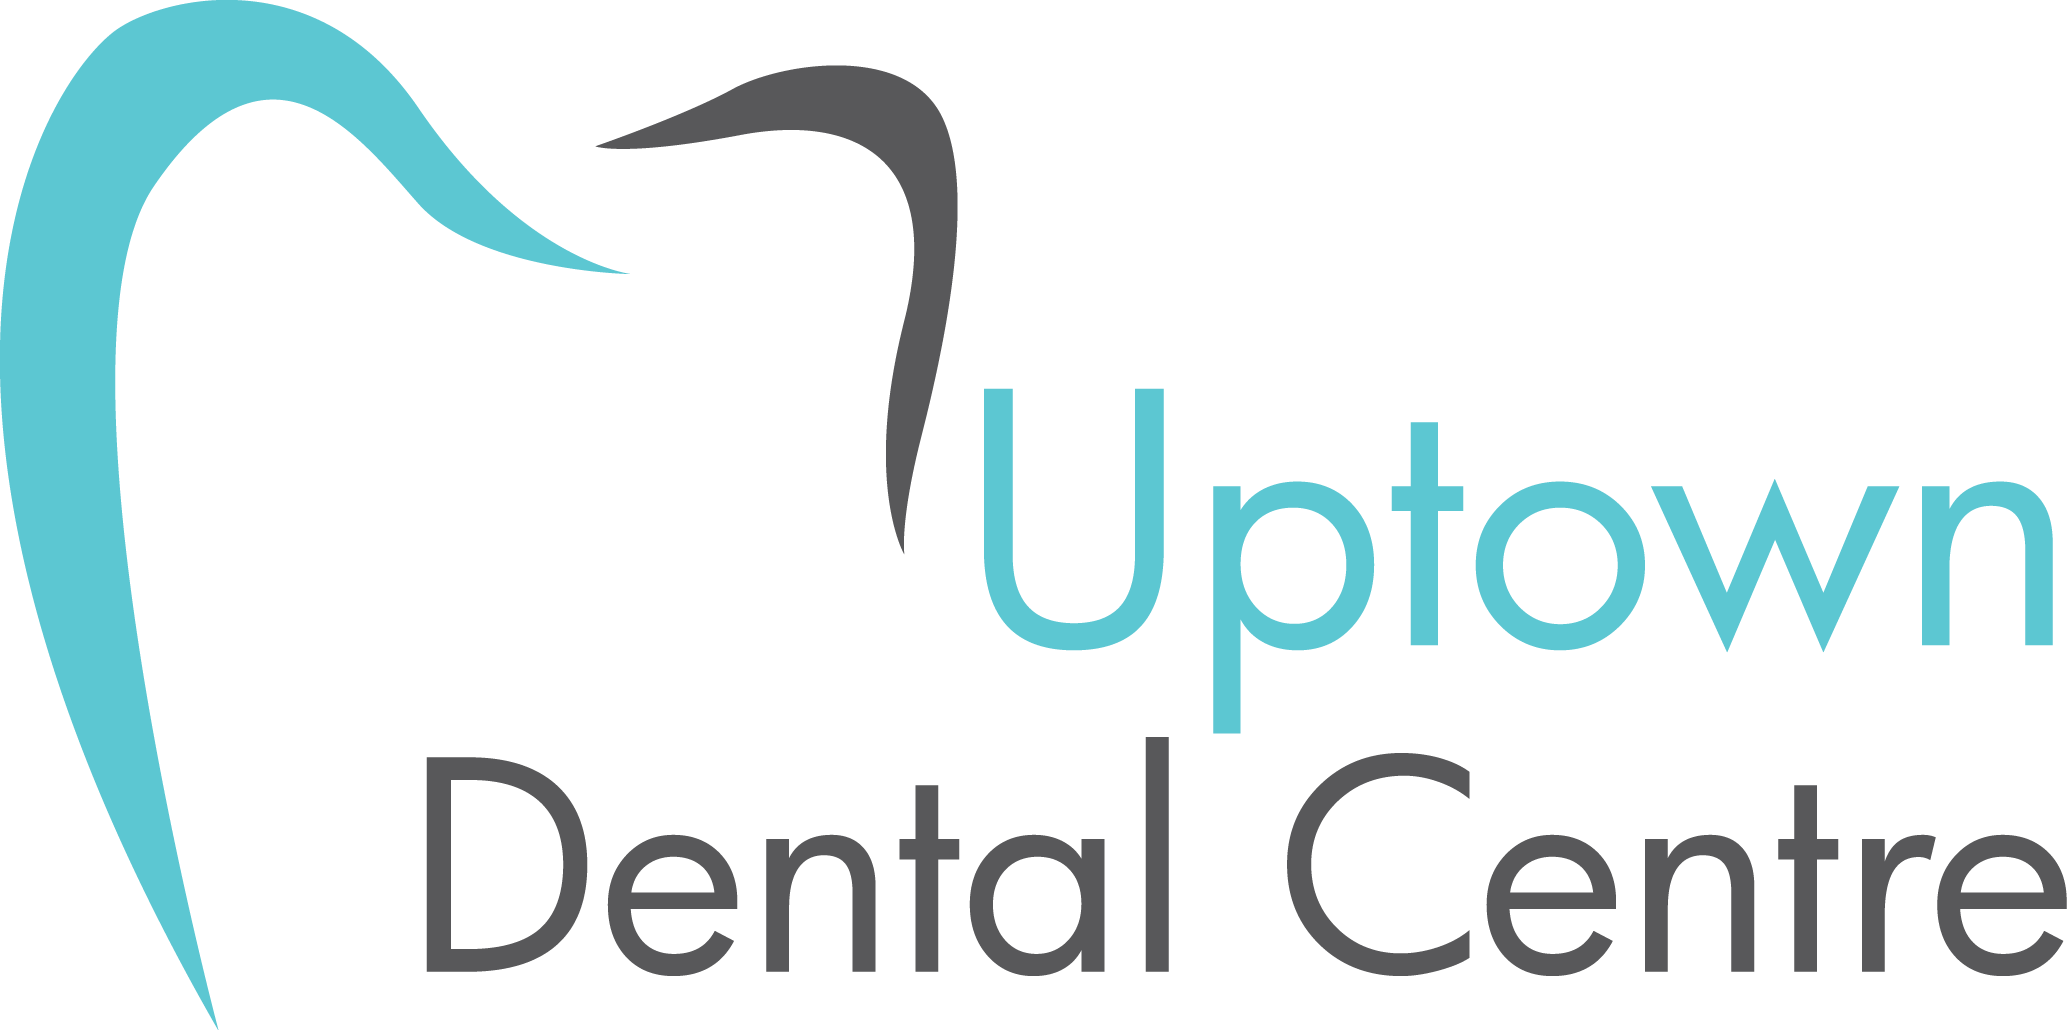 Uptown Dental Center Logo